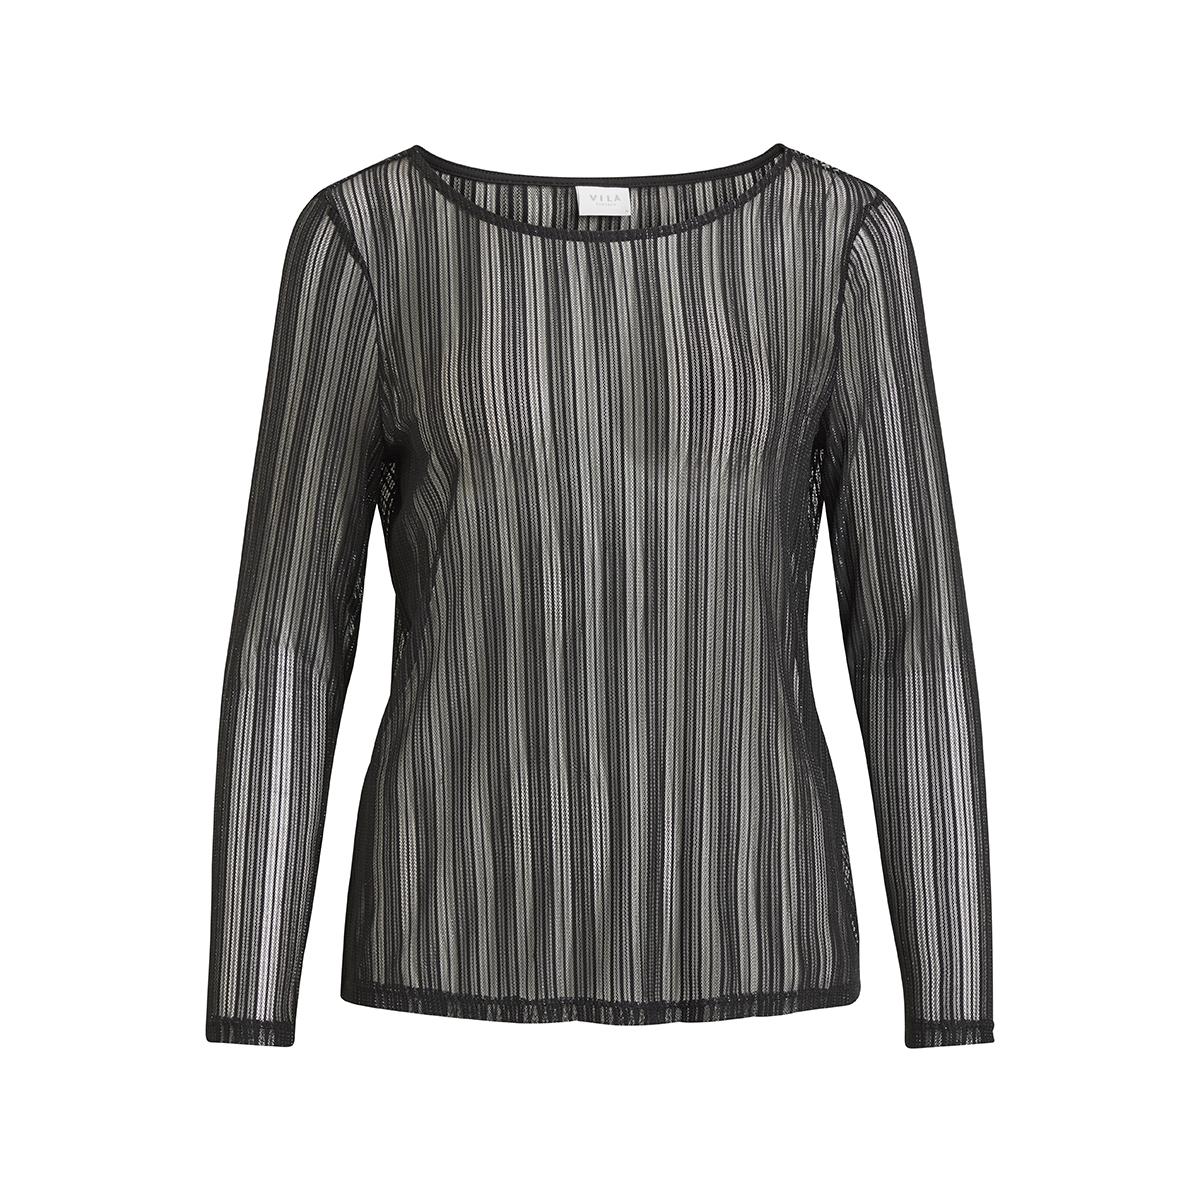 vimanja l/s top 14049205 vila t-shirt black/silver